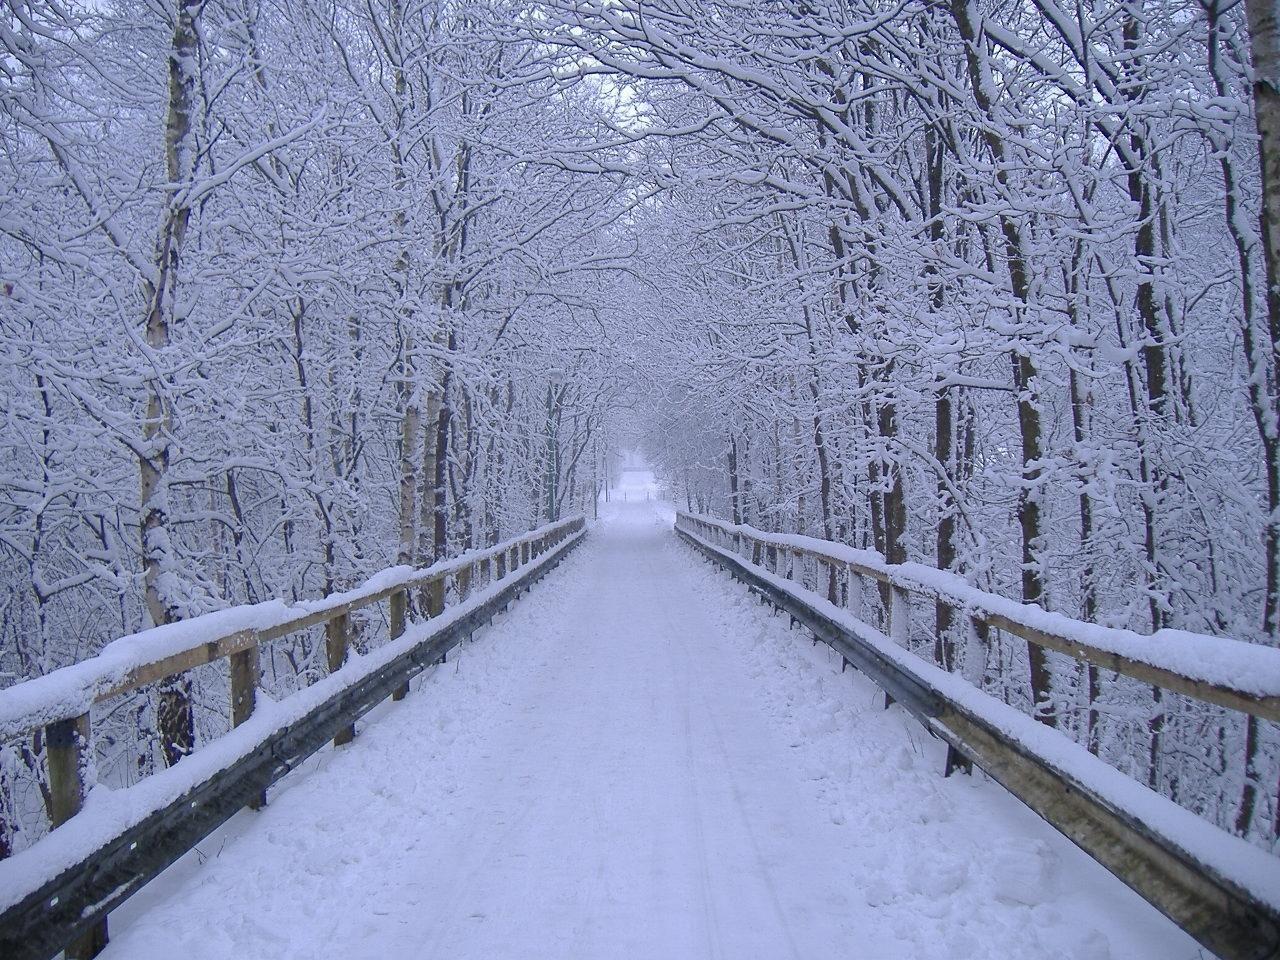 Winter Landscape Design Photos Winter Landscape Winter Scenery Winter Pictures